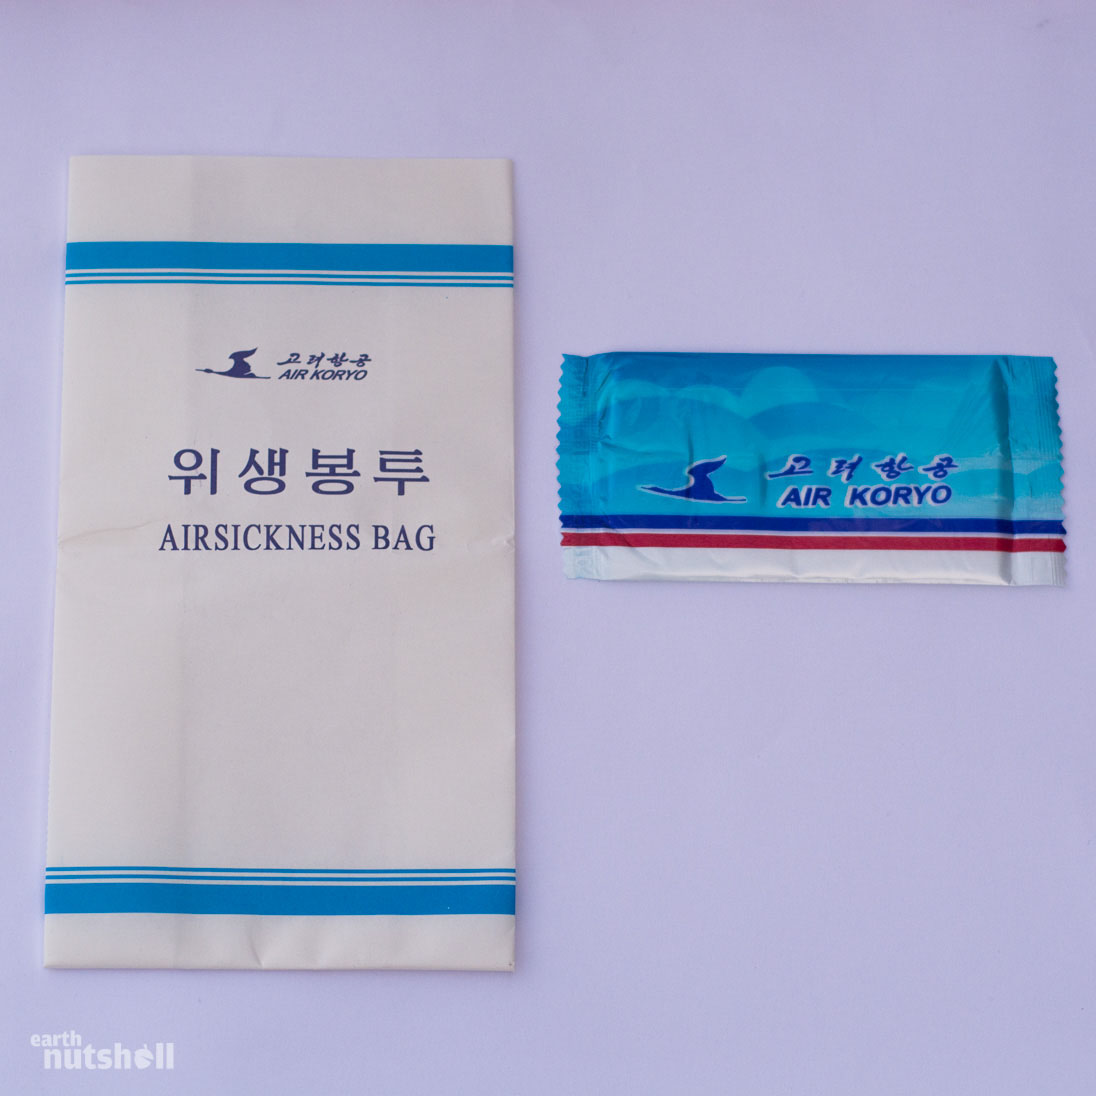 dprk-air-koryo-souvenirs